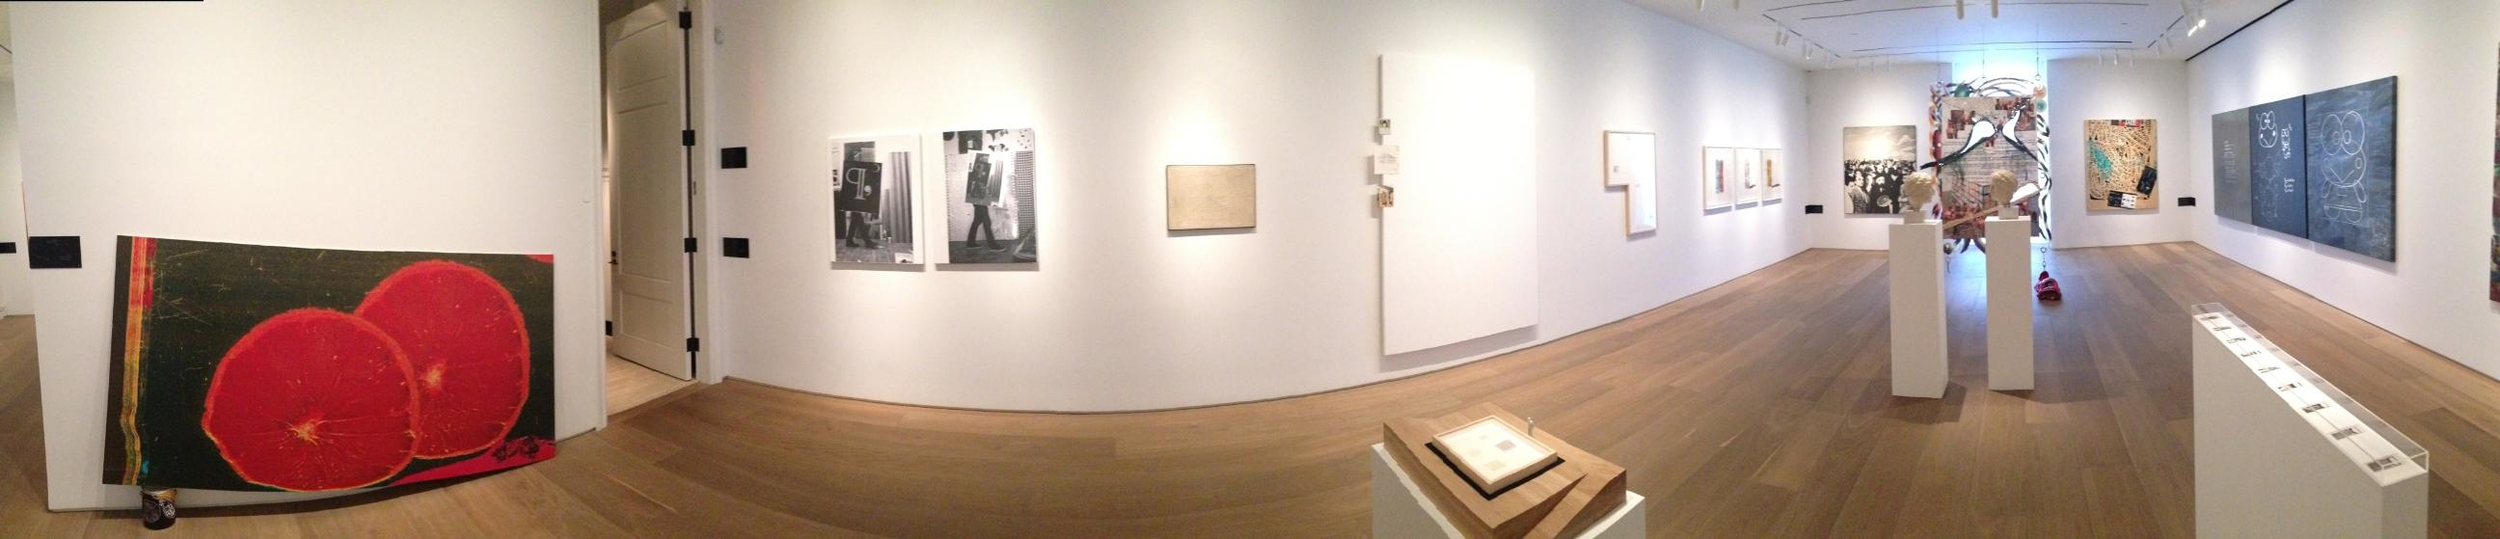 Exhibition Images, Hypothesis for an Exhibition ,Dominique Lévy, New York. Photo Credit:Cincala Art Advisory